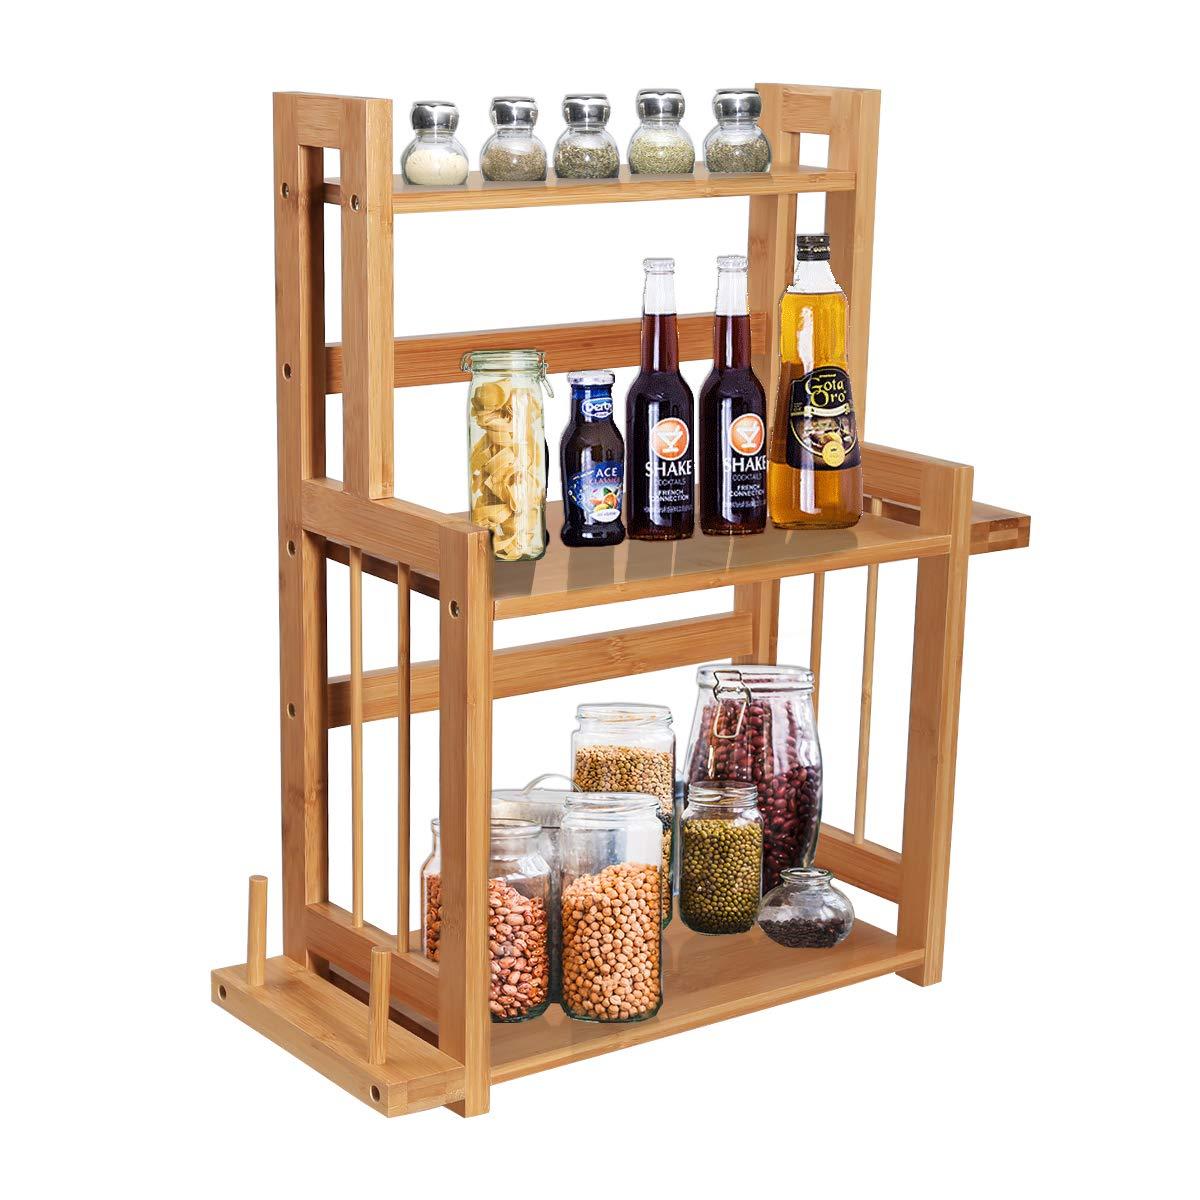 Yardeen 3-Tier Bamboo Spice Rack - Multi-Purpose Waterproof Wooden Countertop Storage Organizer Shelf for Kitchen and Bathroom